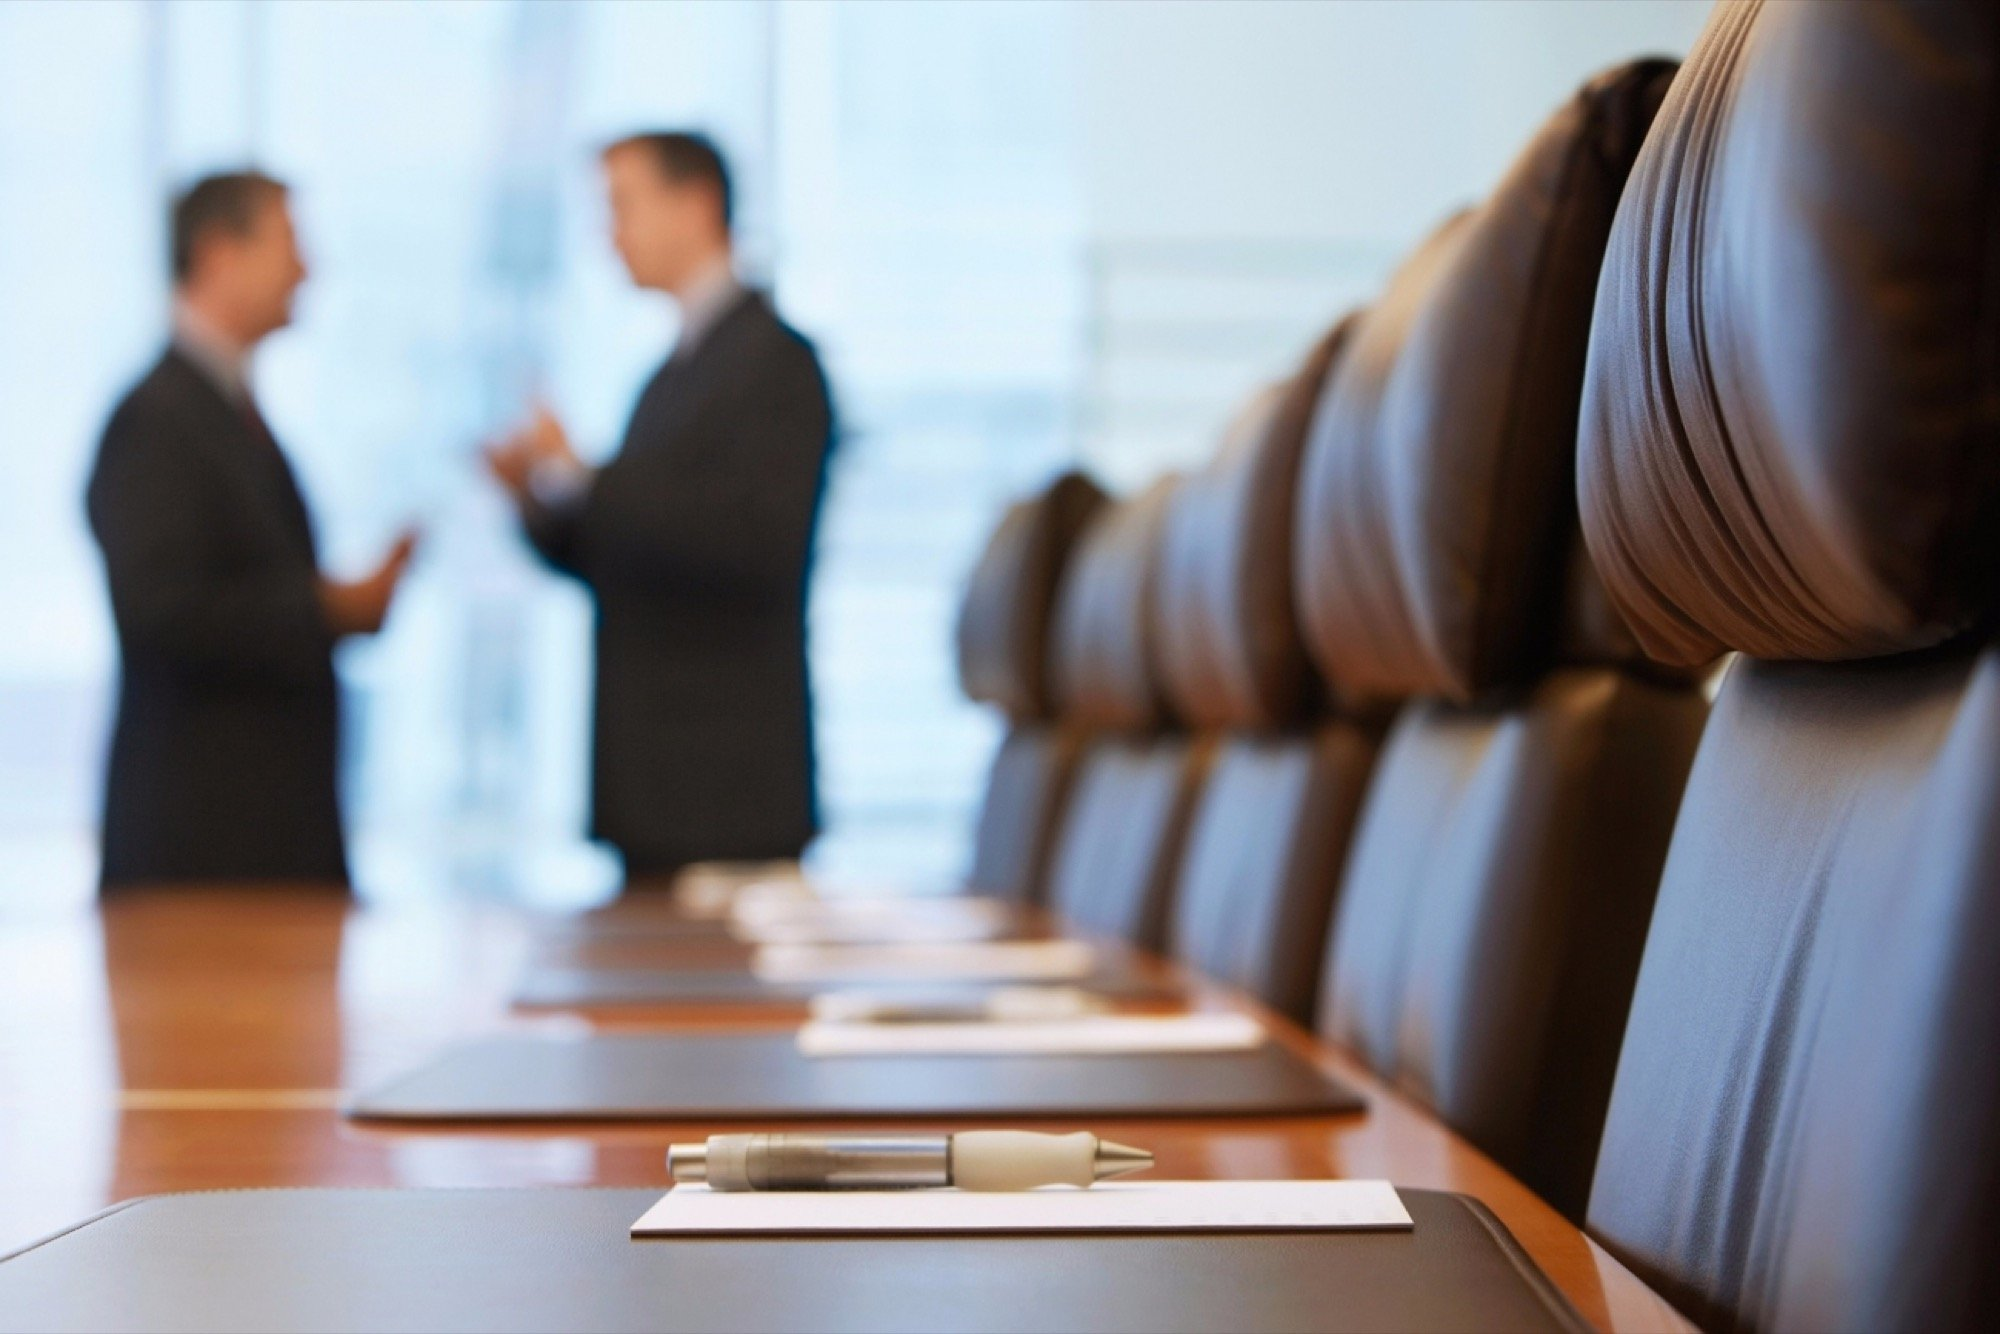 20150903172723-businessmen-meeting-politics-executives-conference-room-negotiations